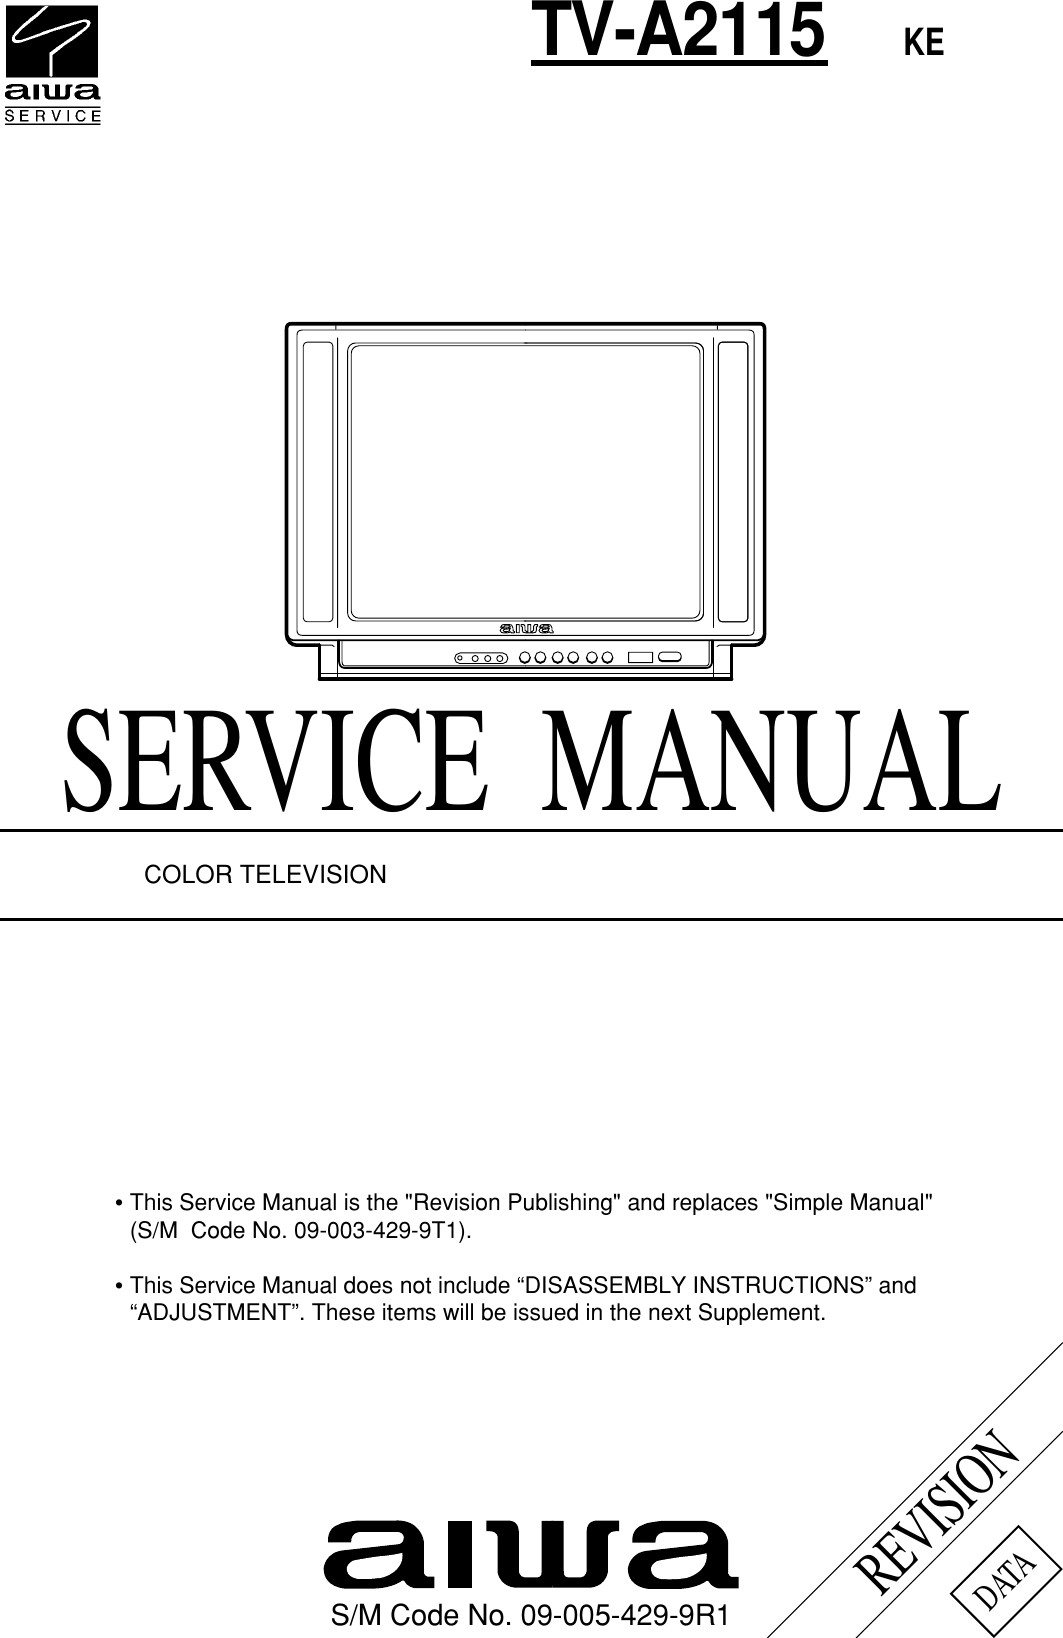 Aiwa Tv A2115 Users Manual Wiring Diagram